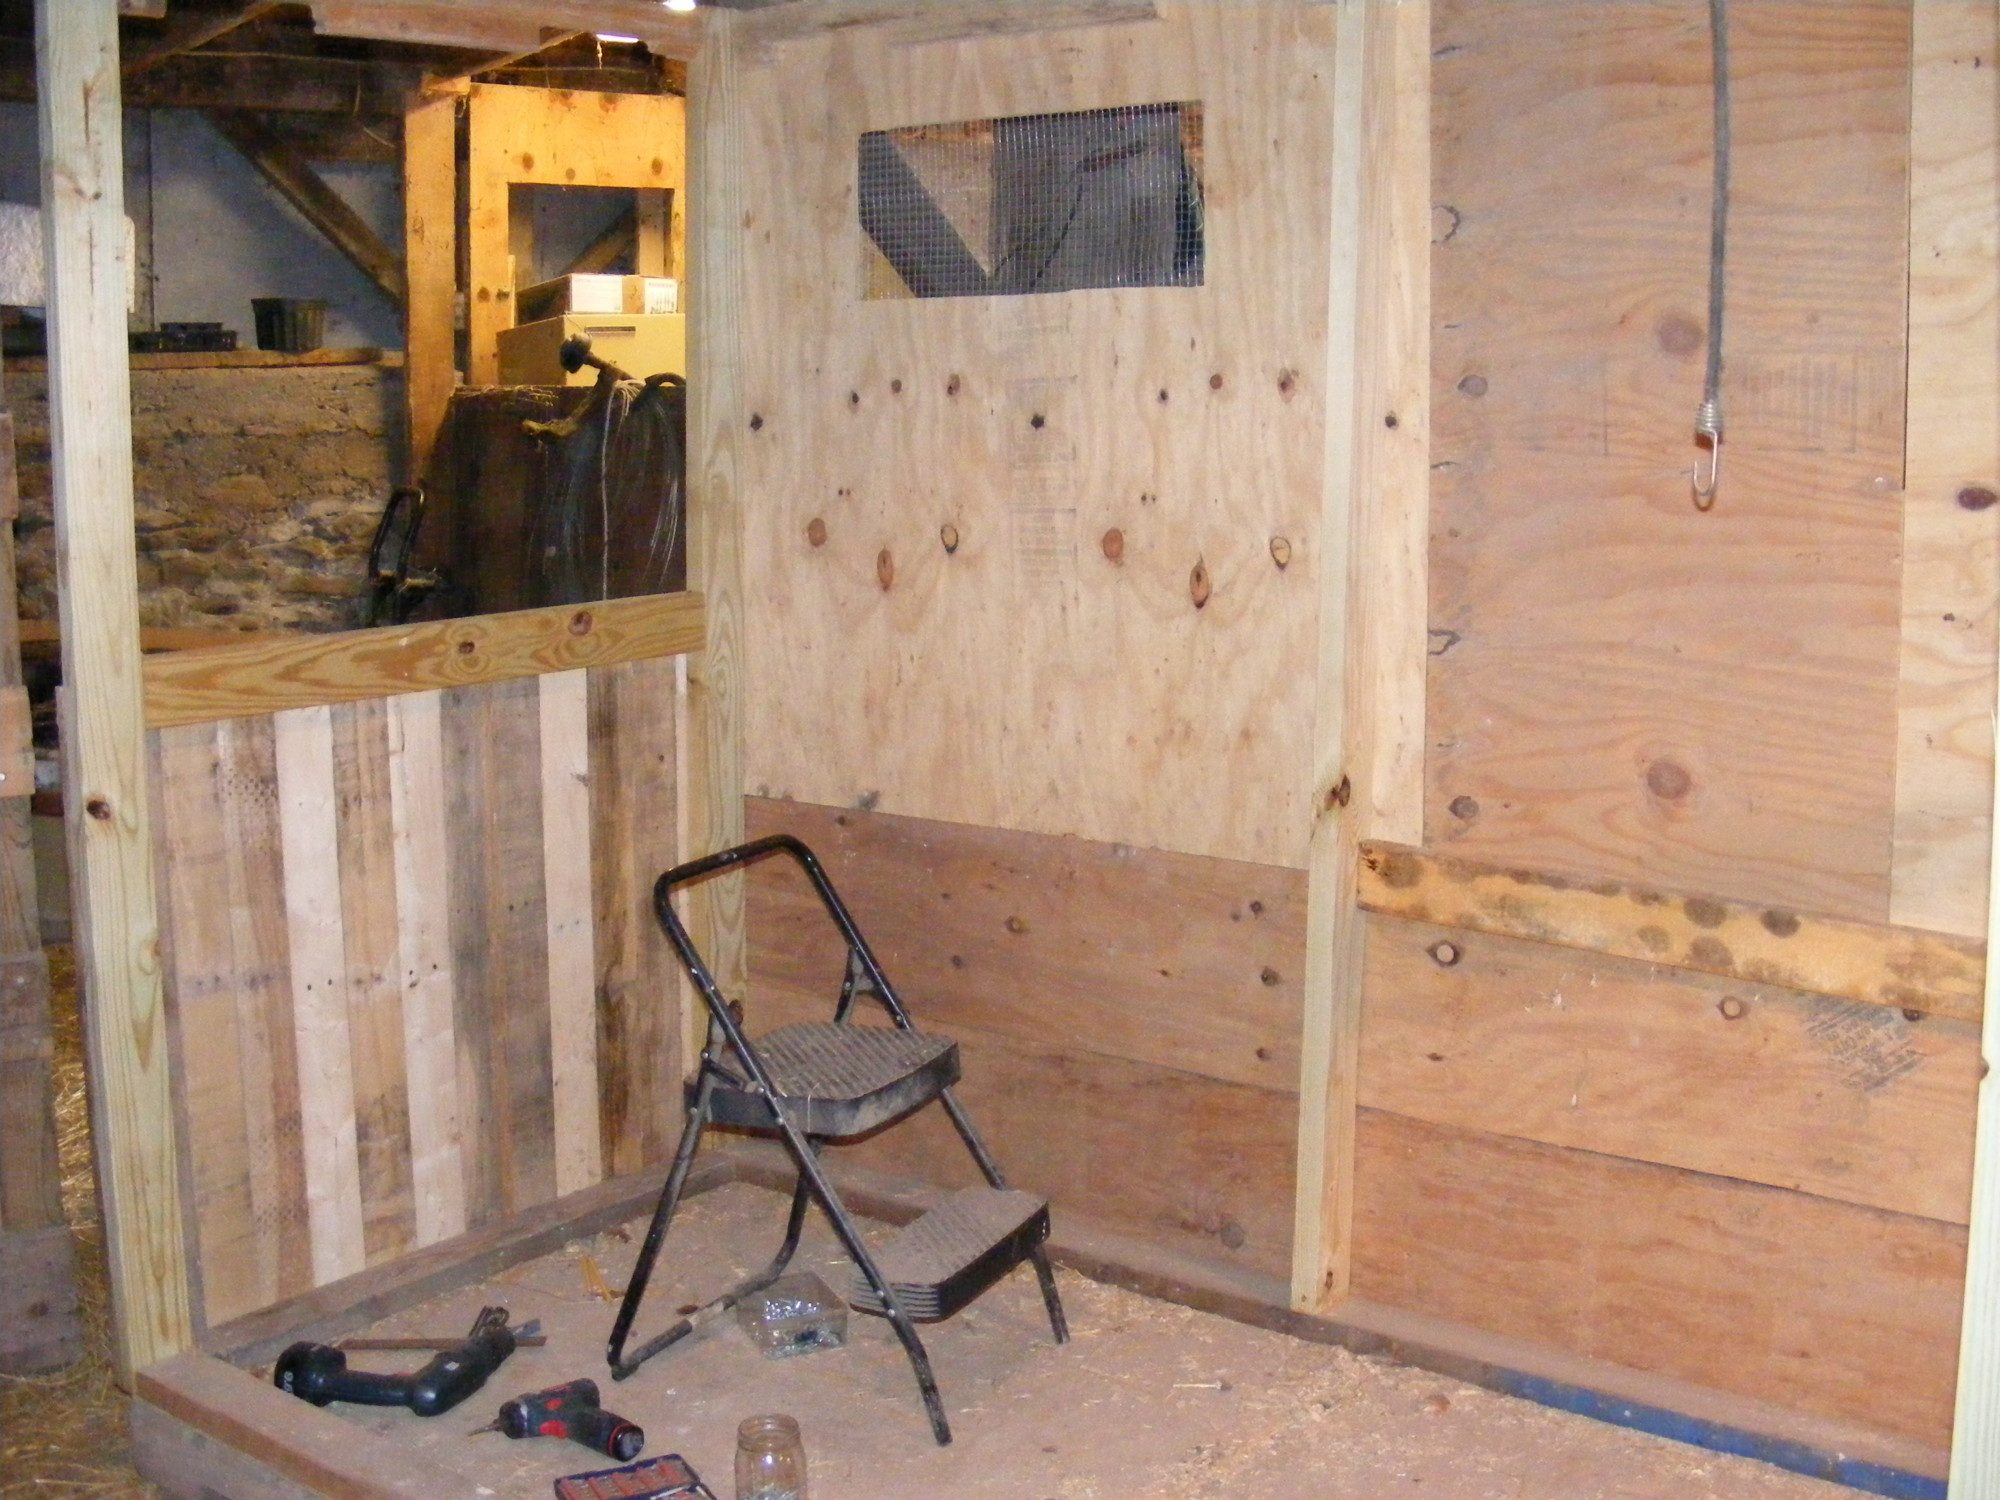 coop #2 under construction